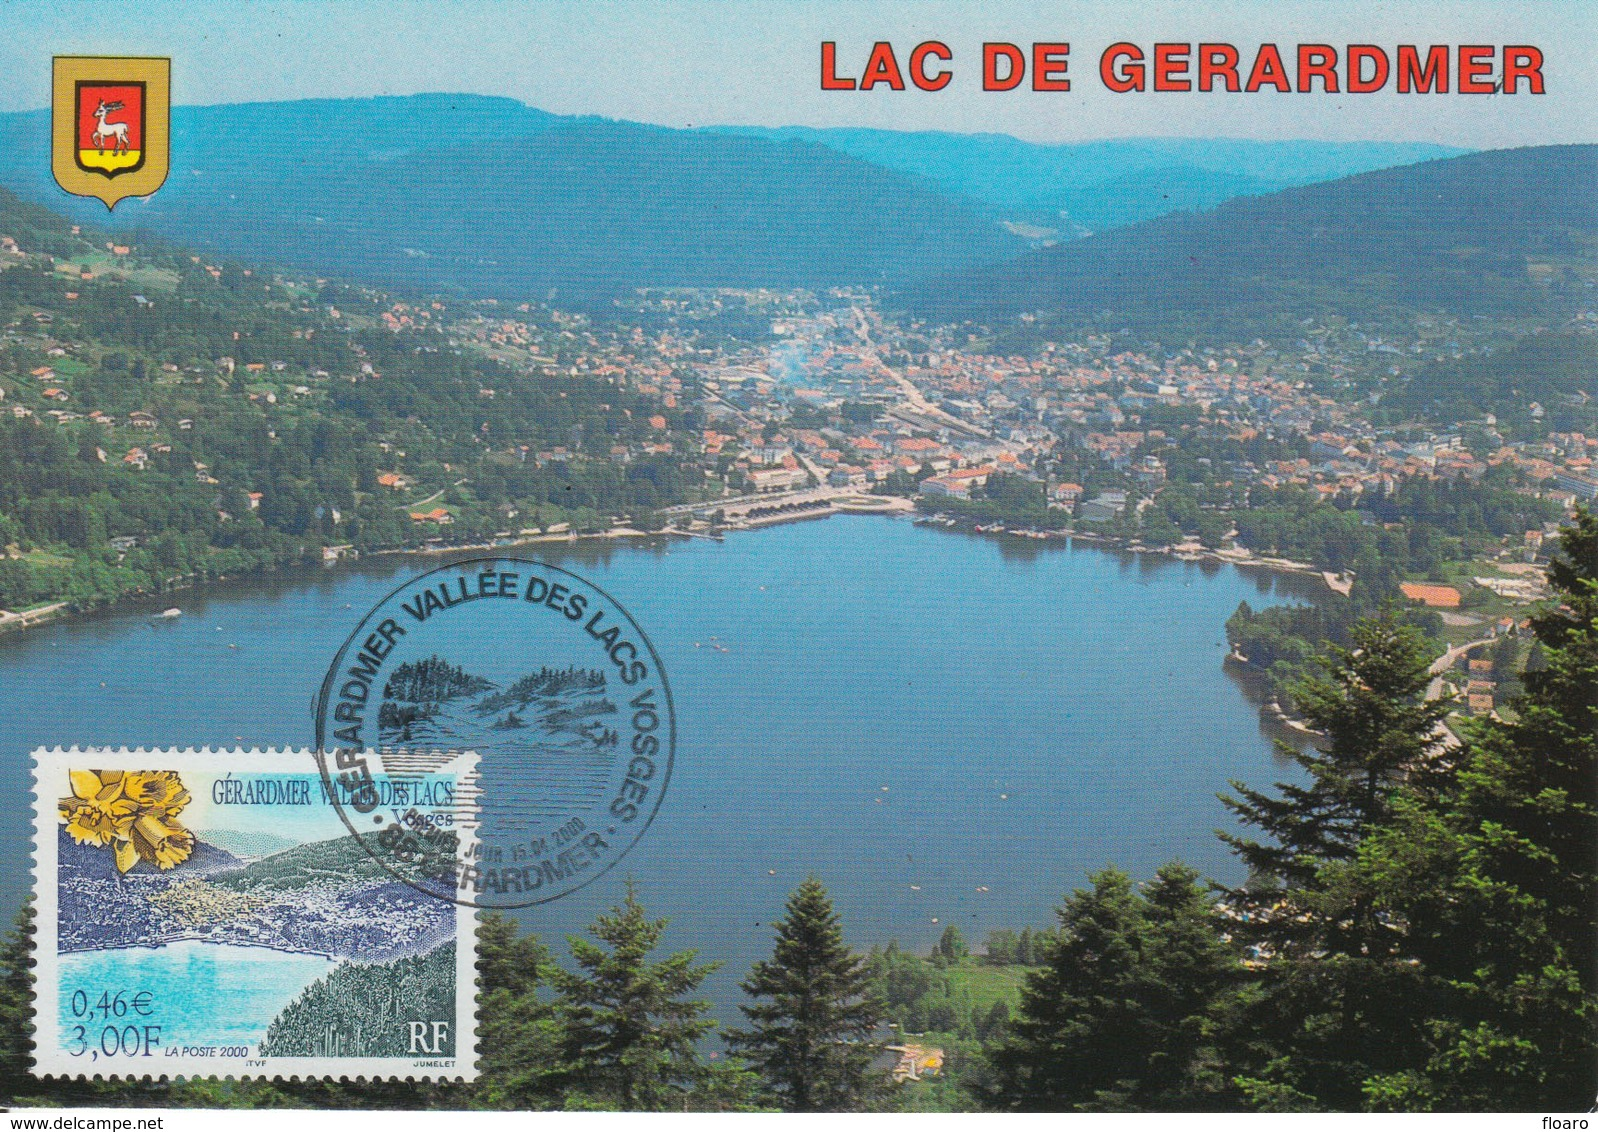 Carte-Maximum FRANCE N°Yvert 3311  / Lac De Gérardmer - 2000-09